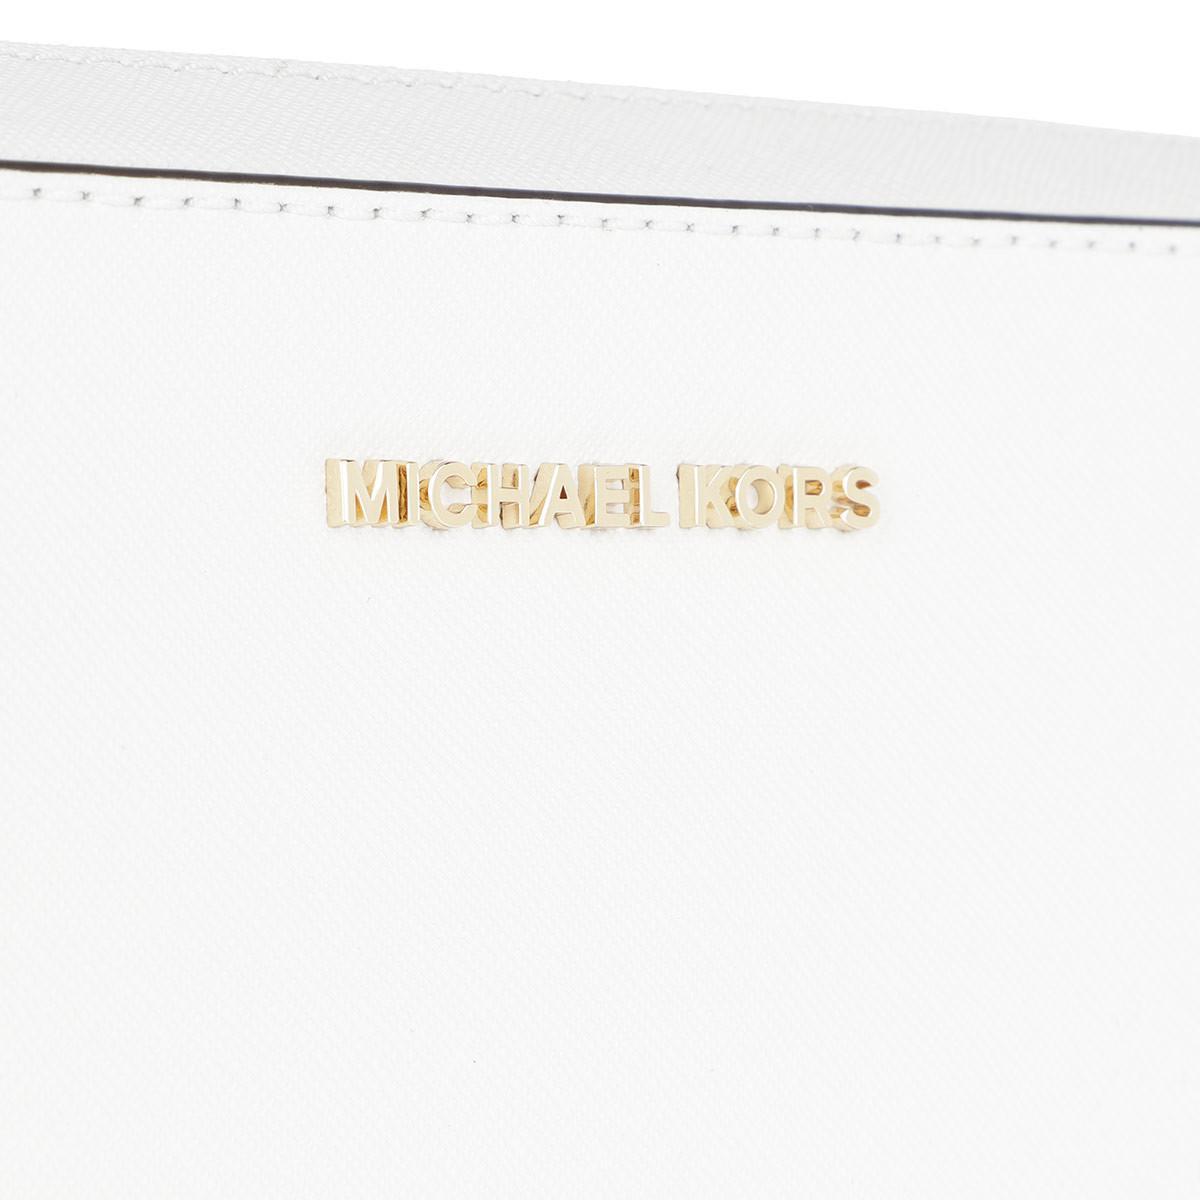 Michael Kors Leather Lg Ew Crossbody Bag Optic White